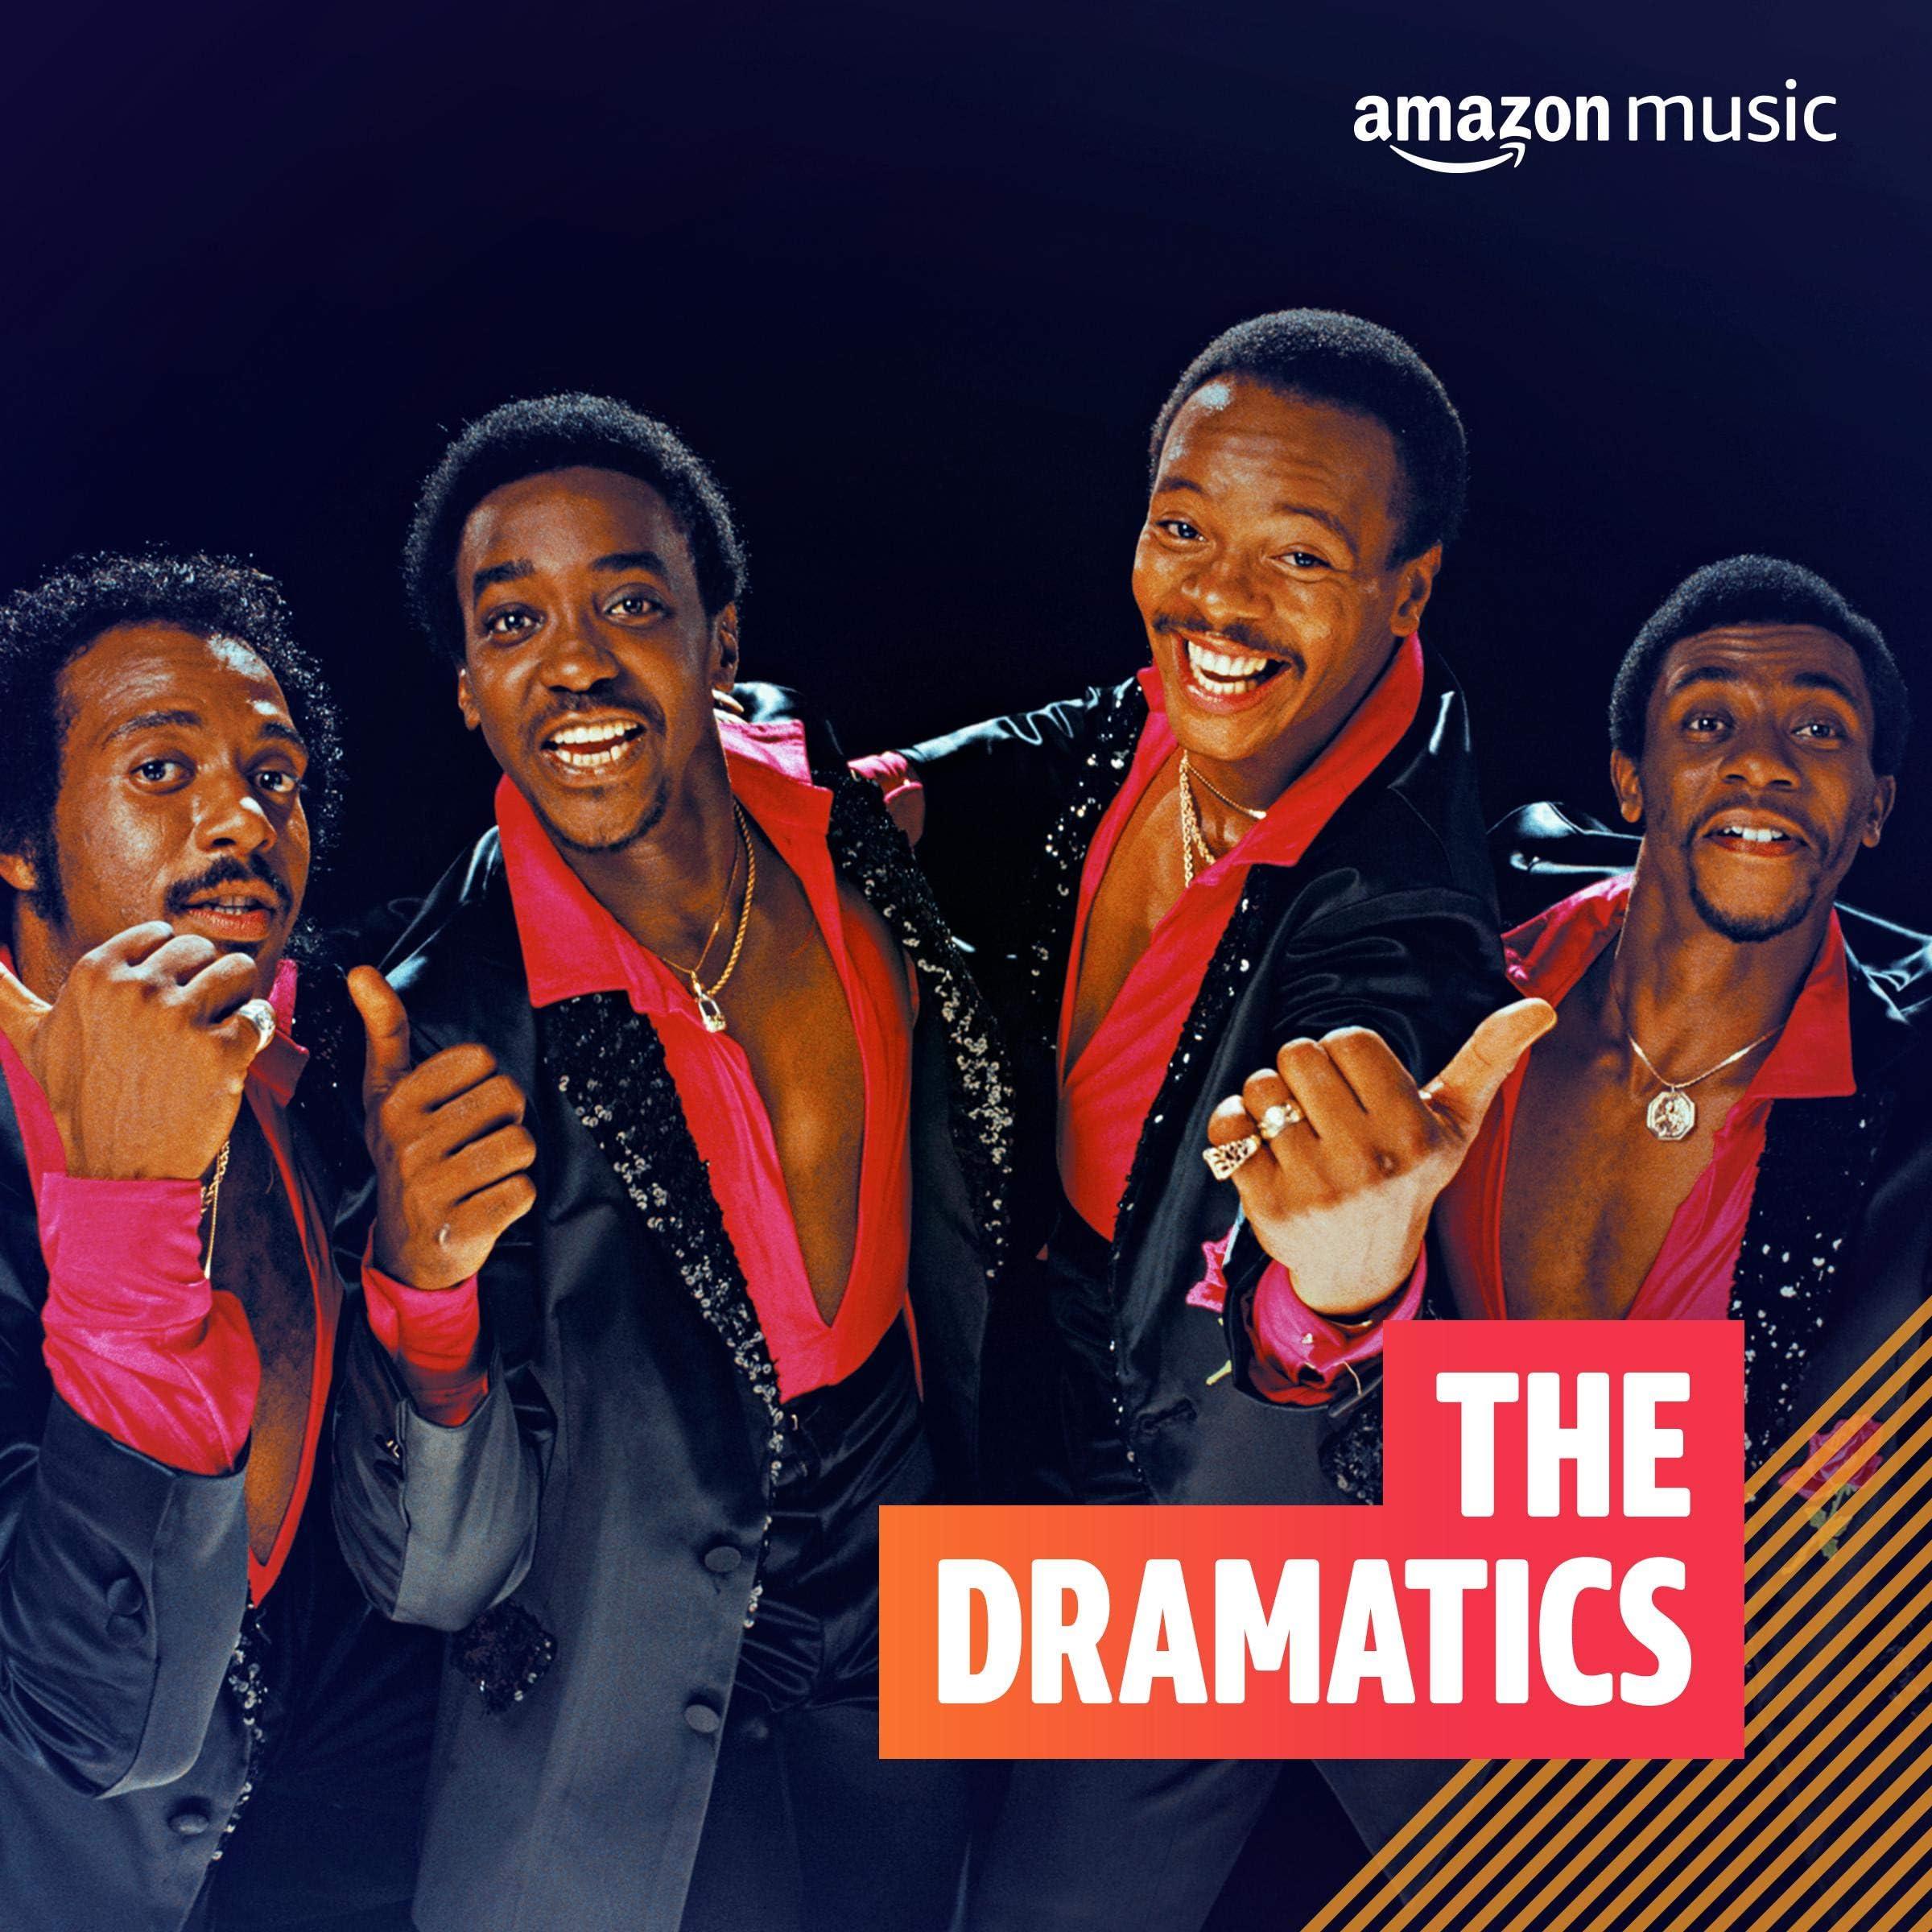 The Dramatics